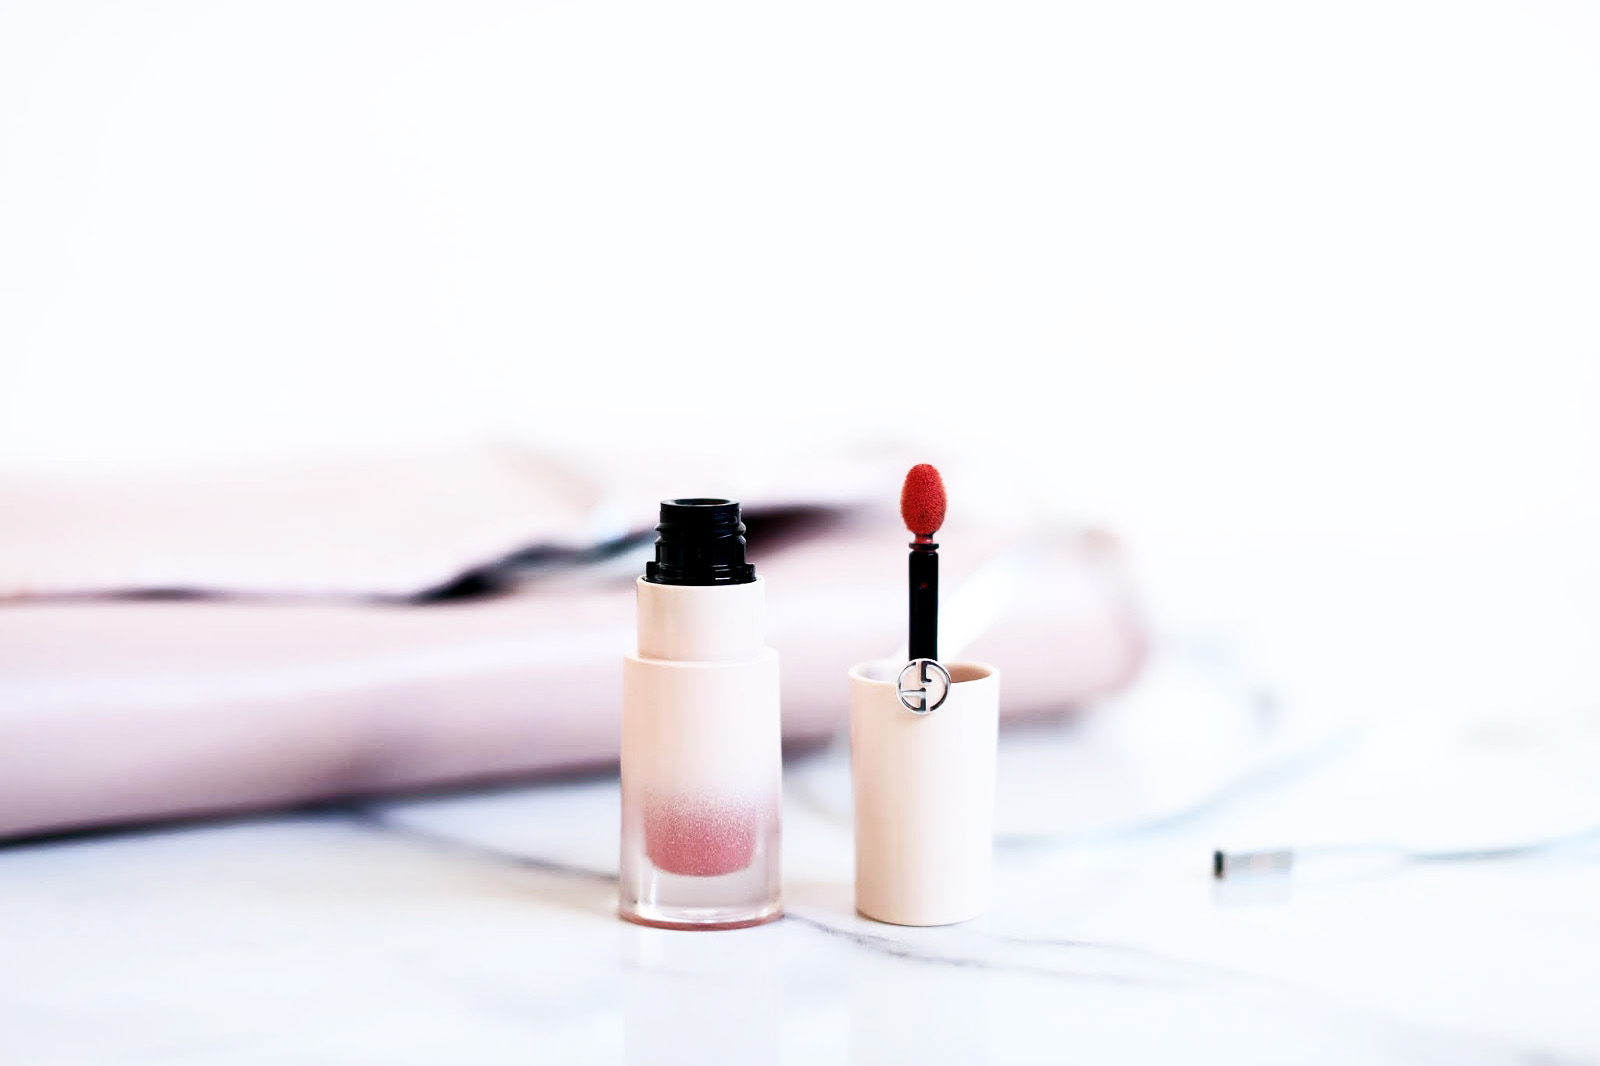 armani nude blush liquide avis test swatches